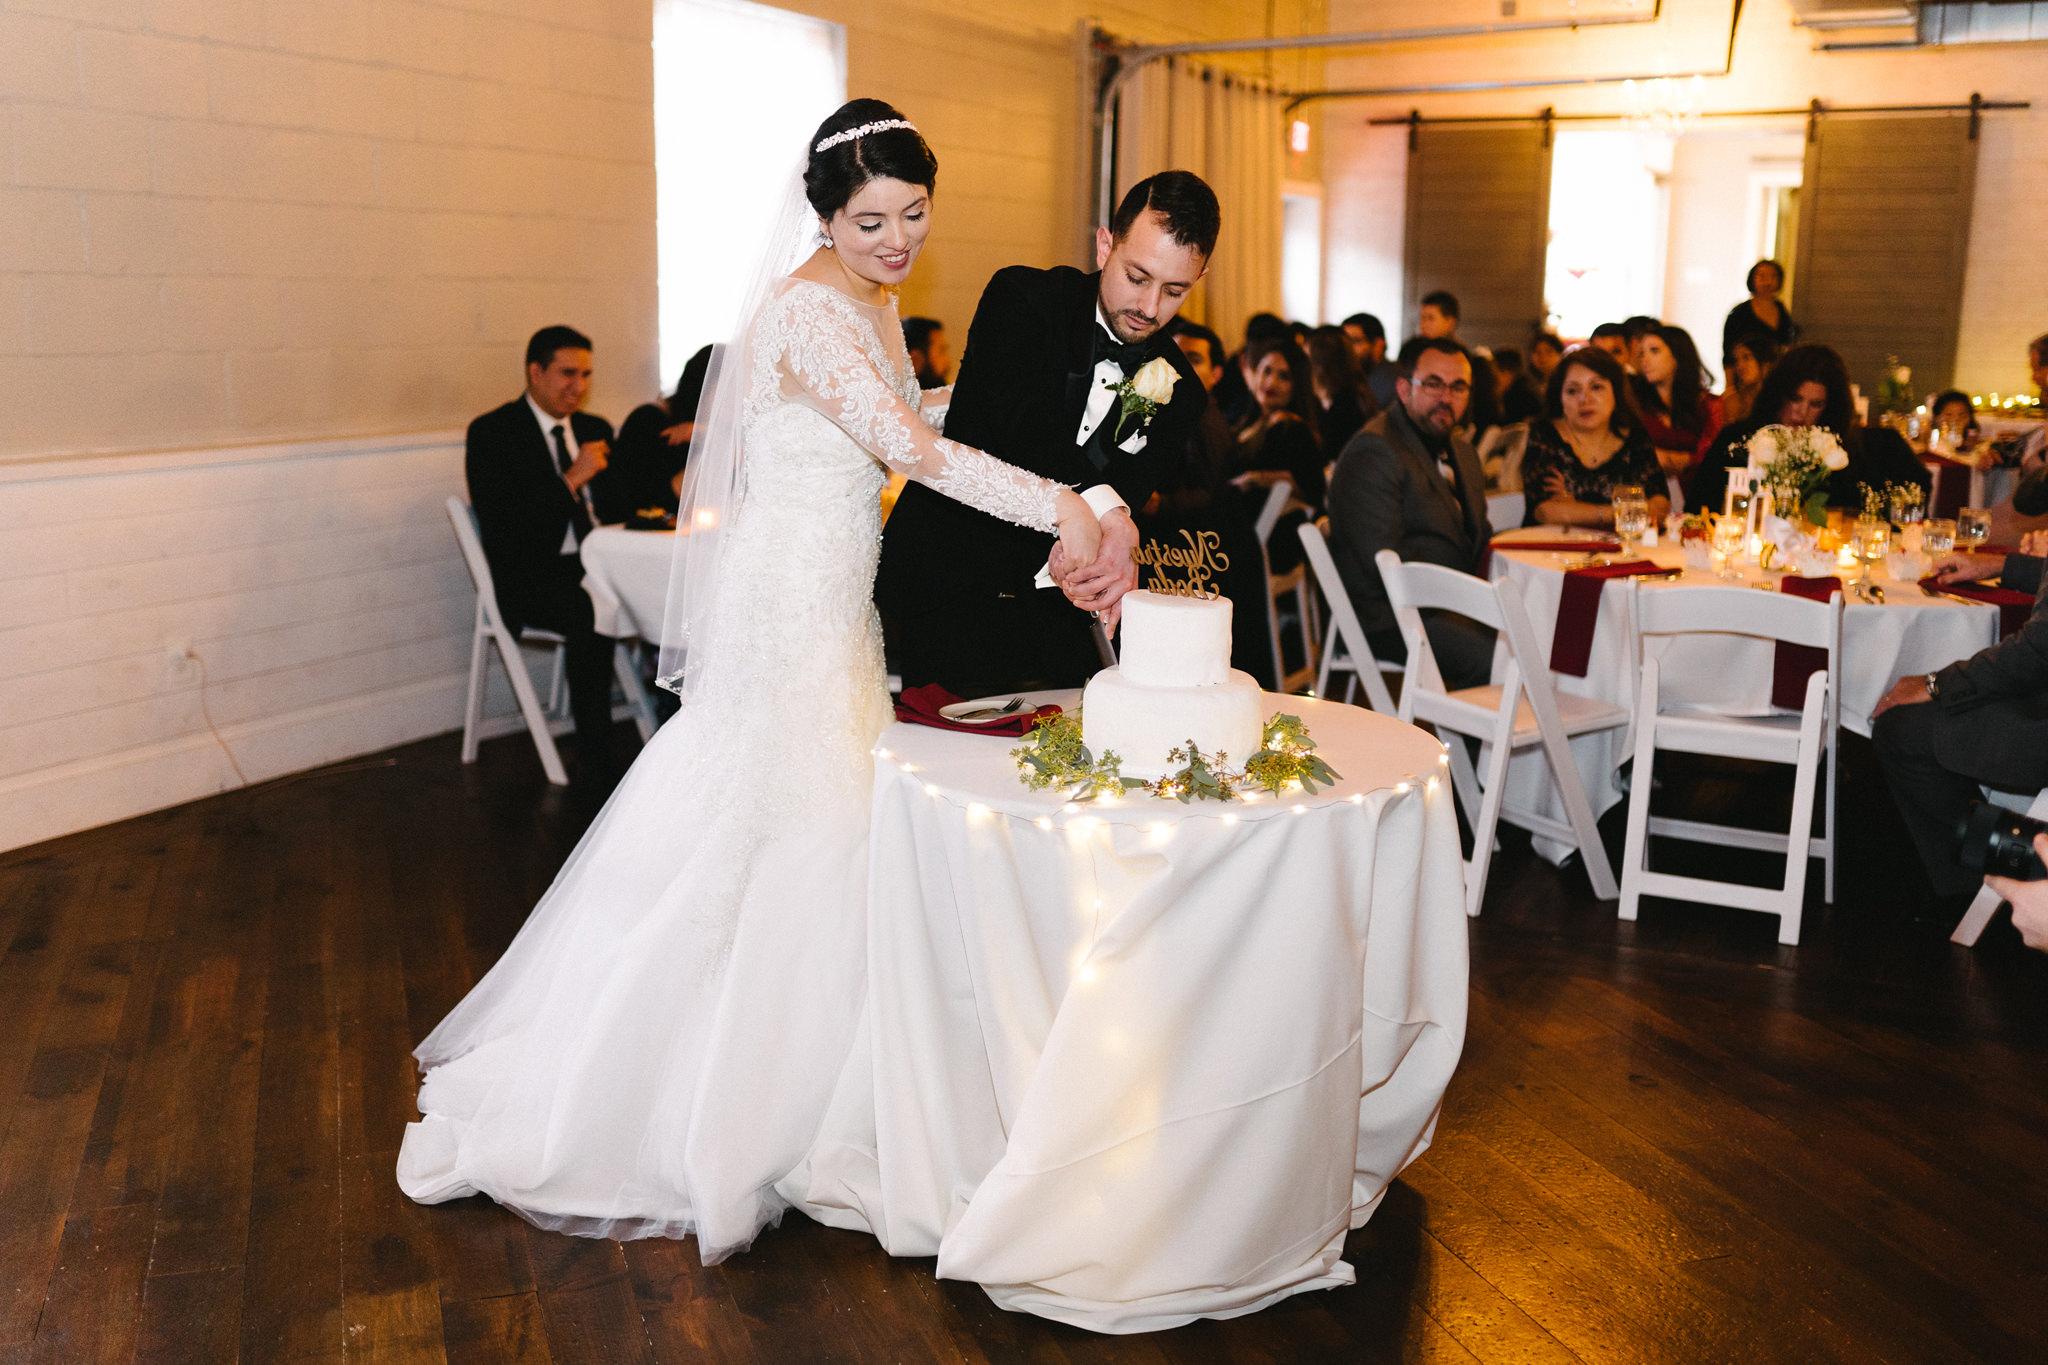 046-rempel-photography-chicago-wedding-inspiration-susan-daniel-michigan-metro-detroit-christian-church-holly-vault-cupcakes-and-kisses.jpg